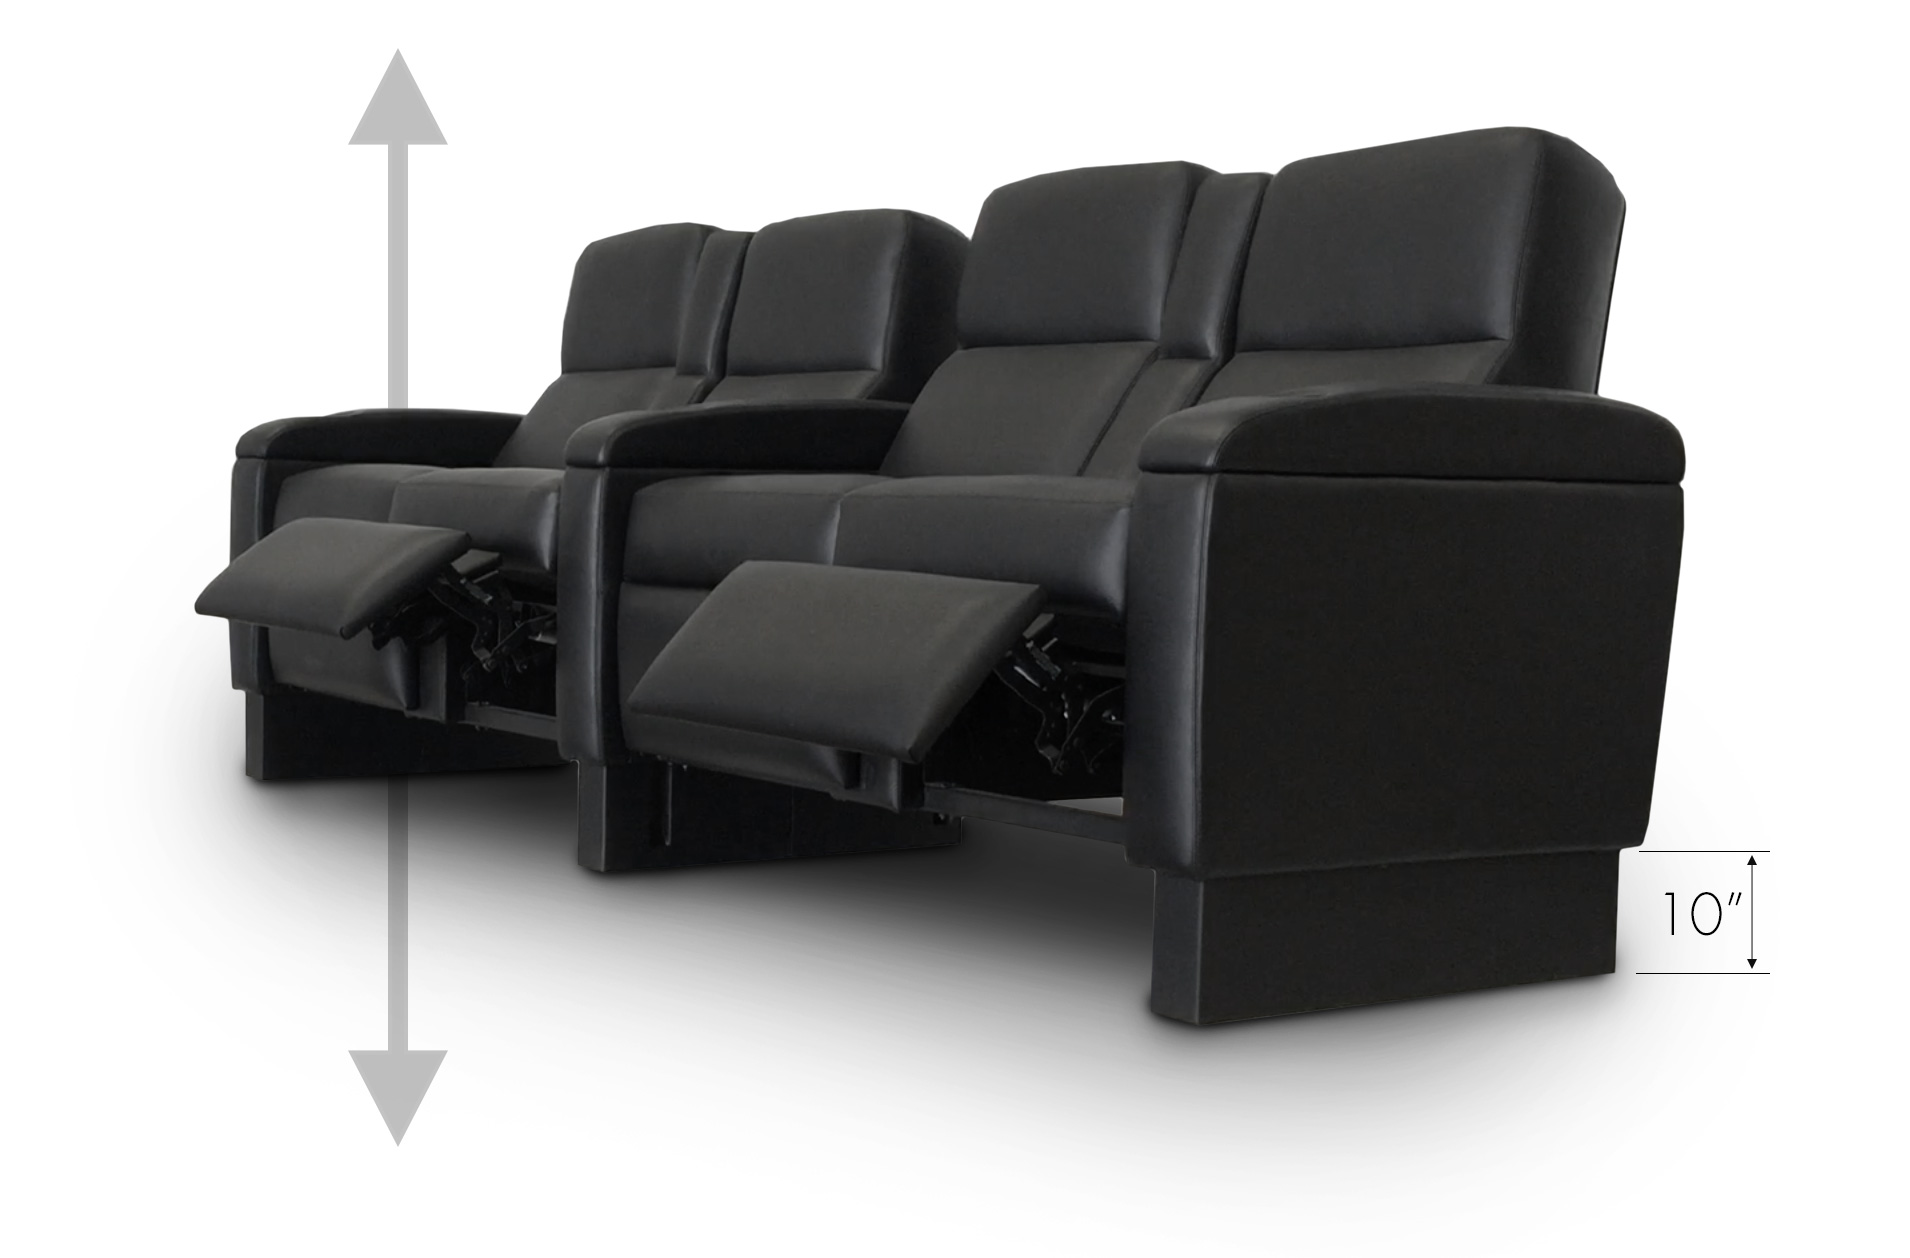 Motorized Adjustable Seat Height Option;Model: Manhattan